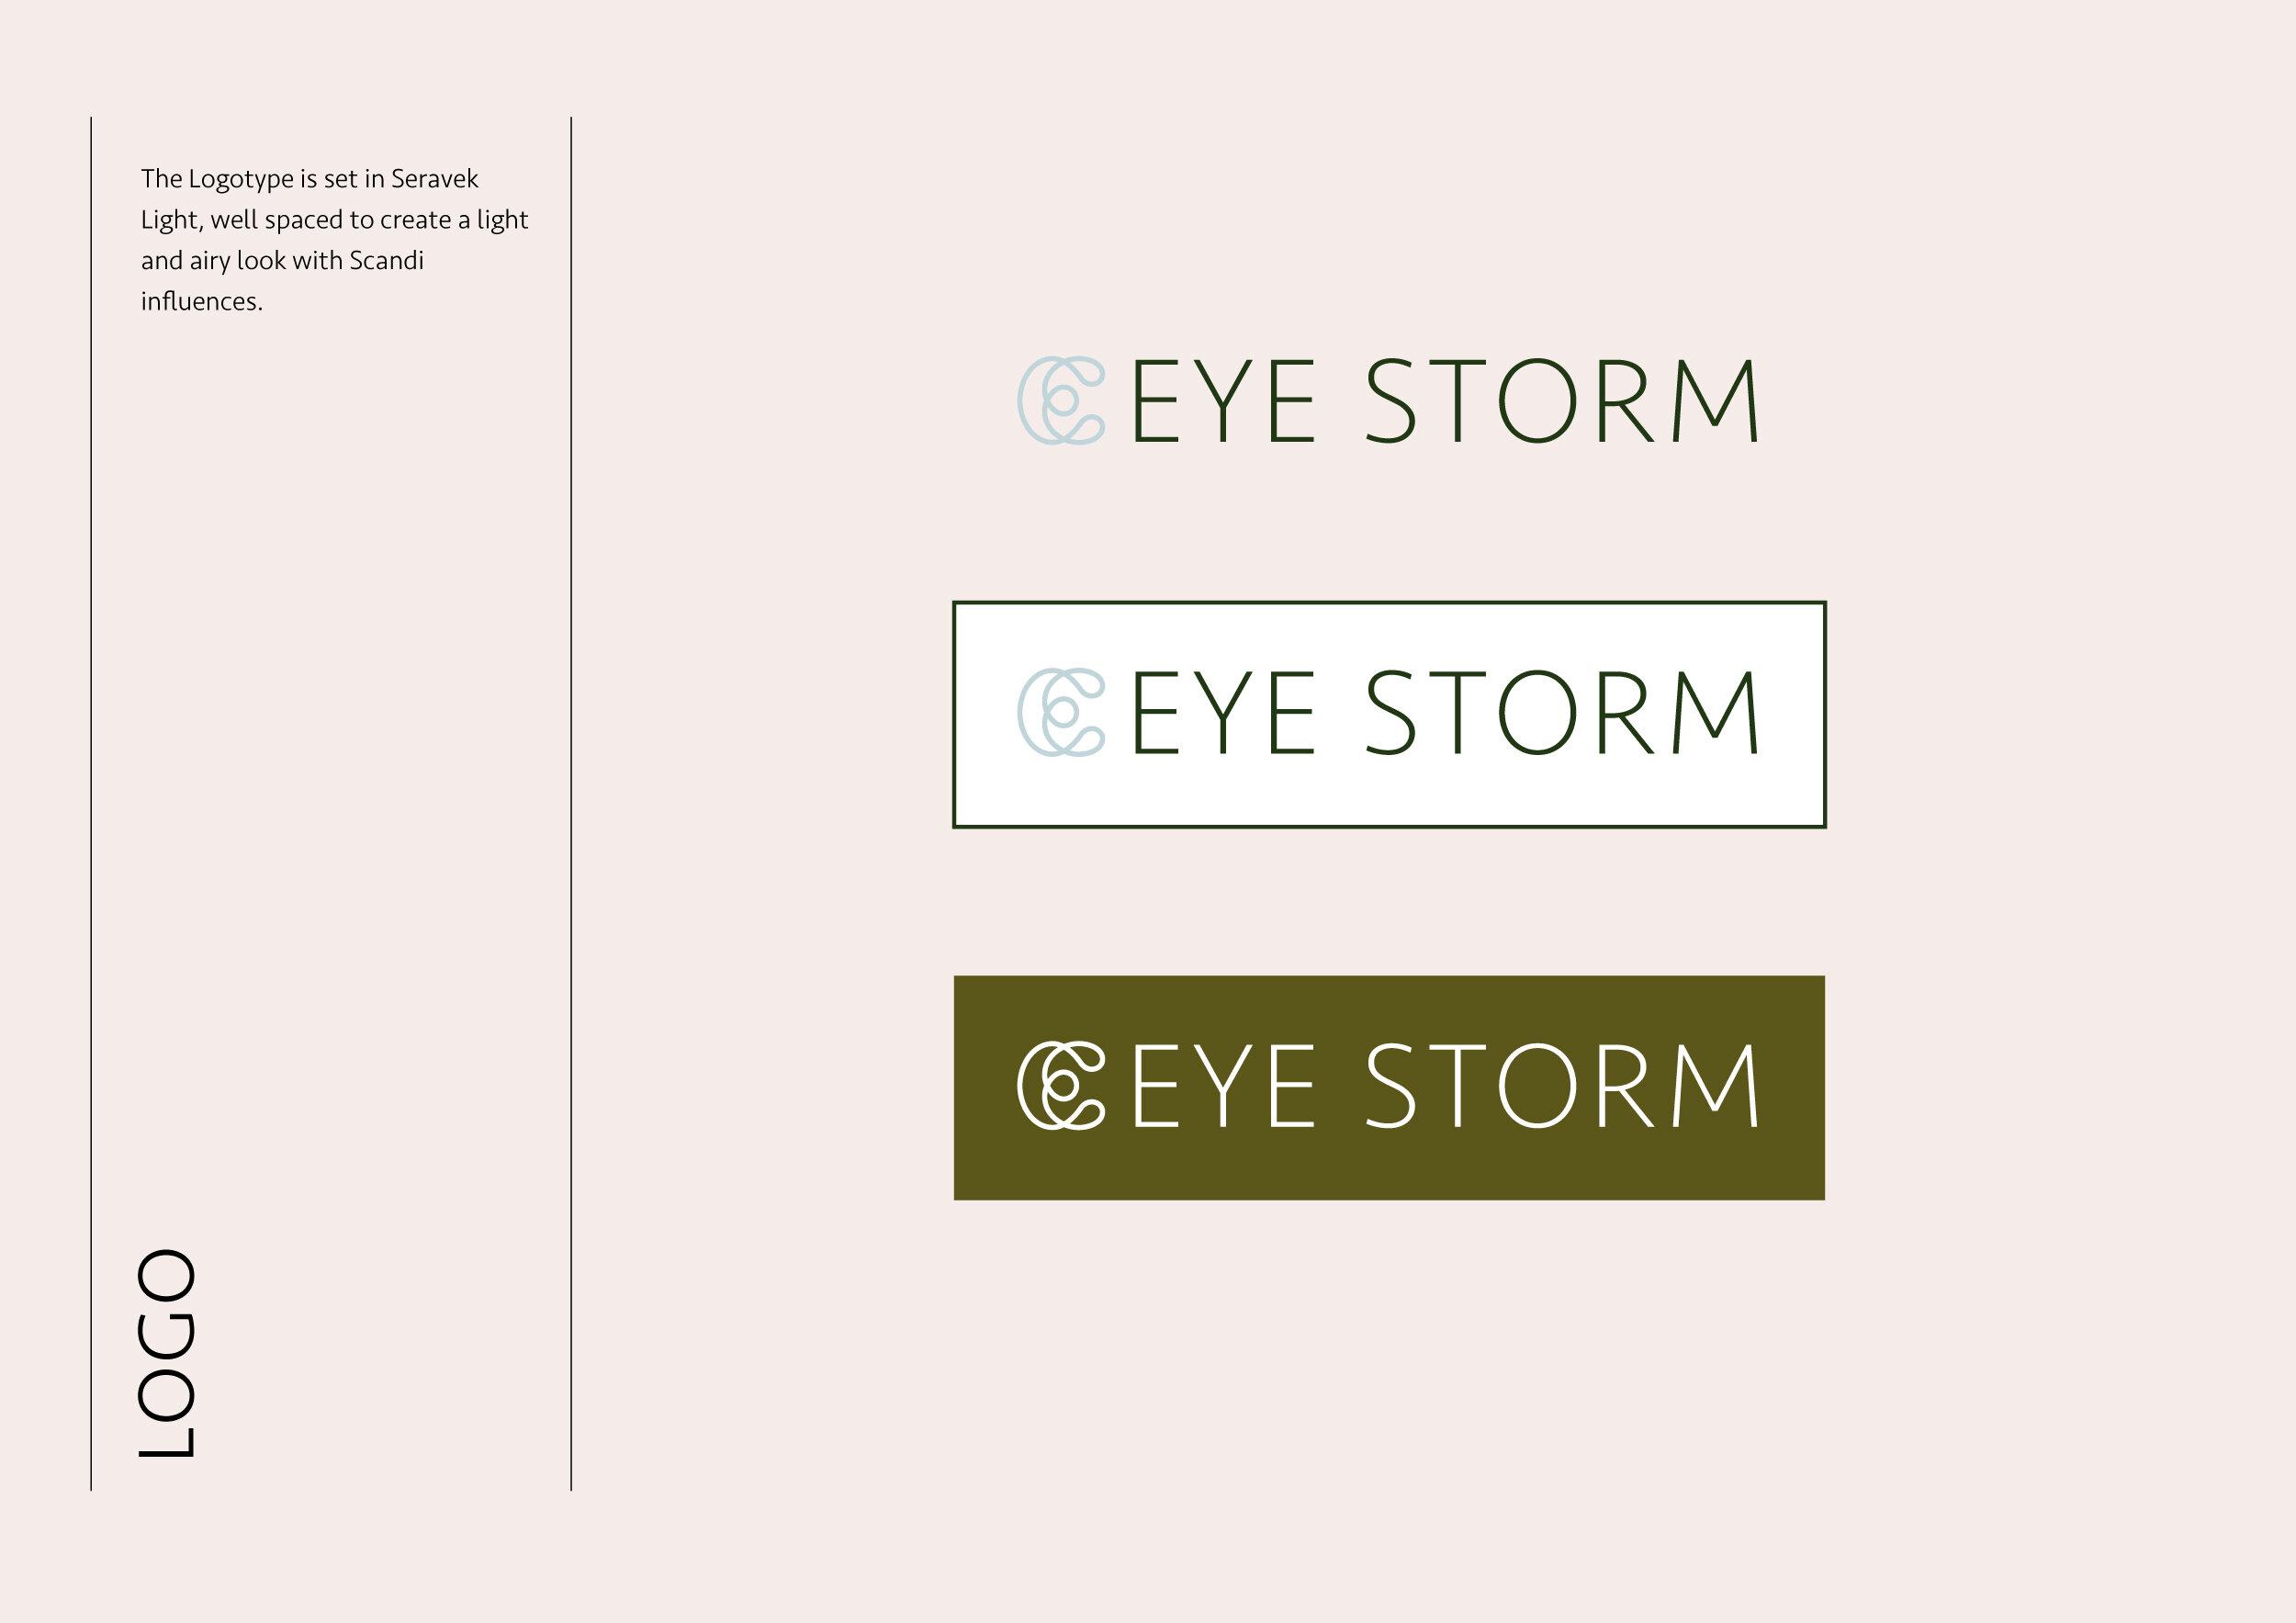 Eyestorm_brand_guide_3.jpg